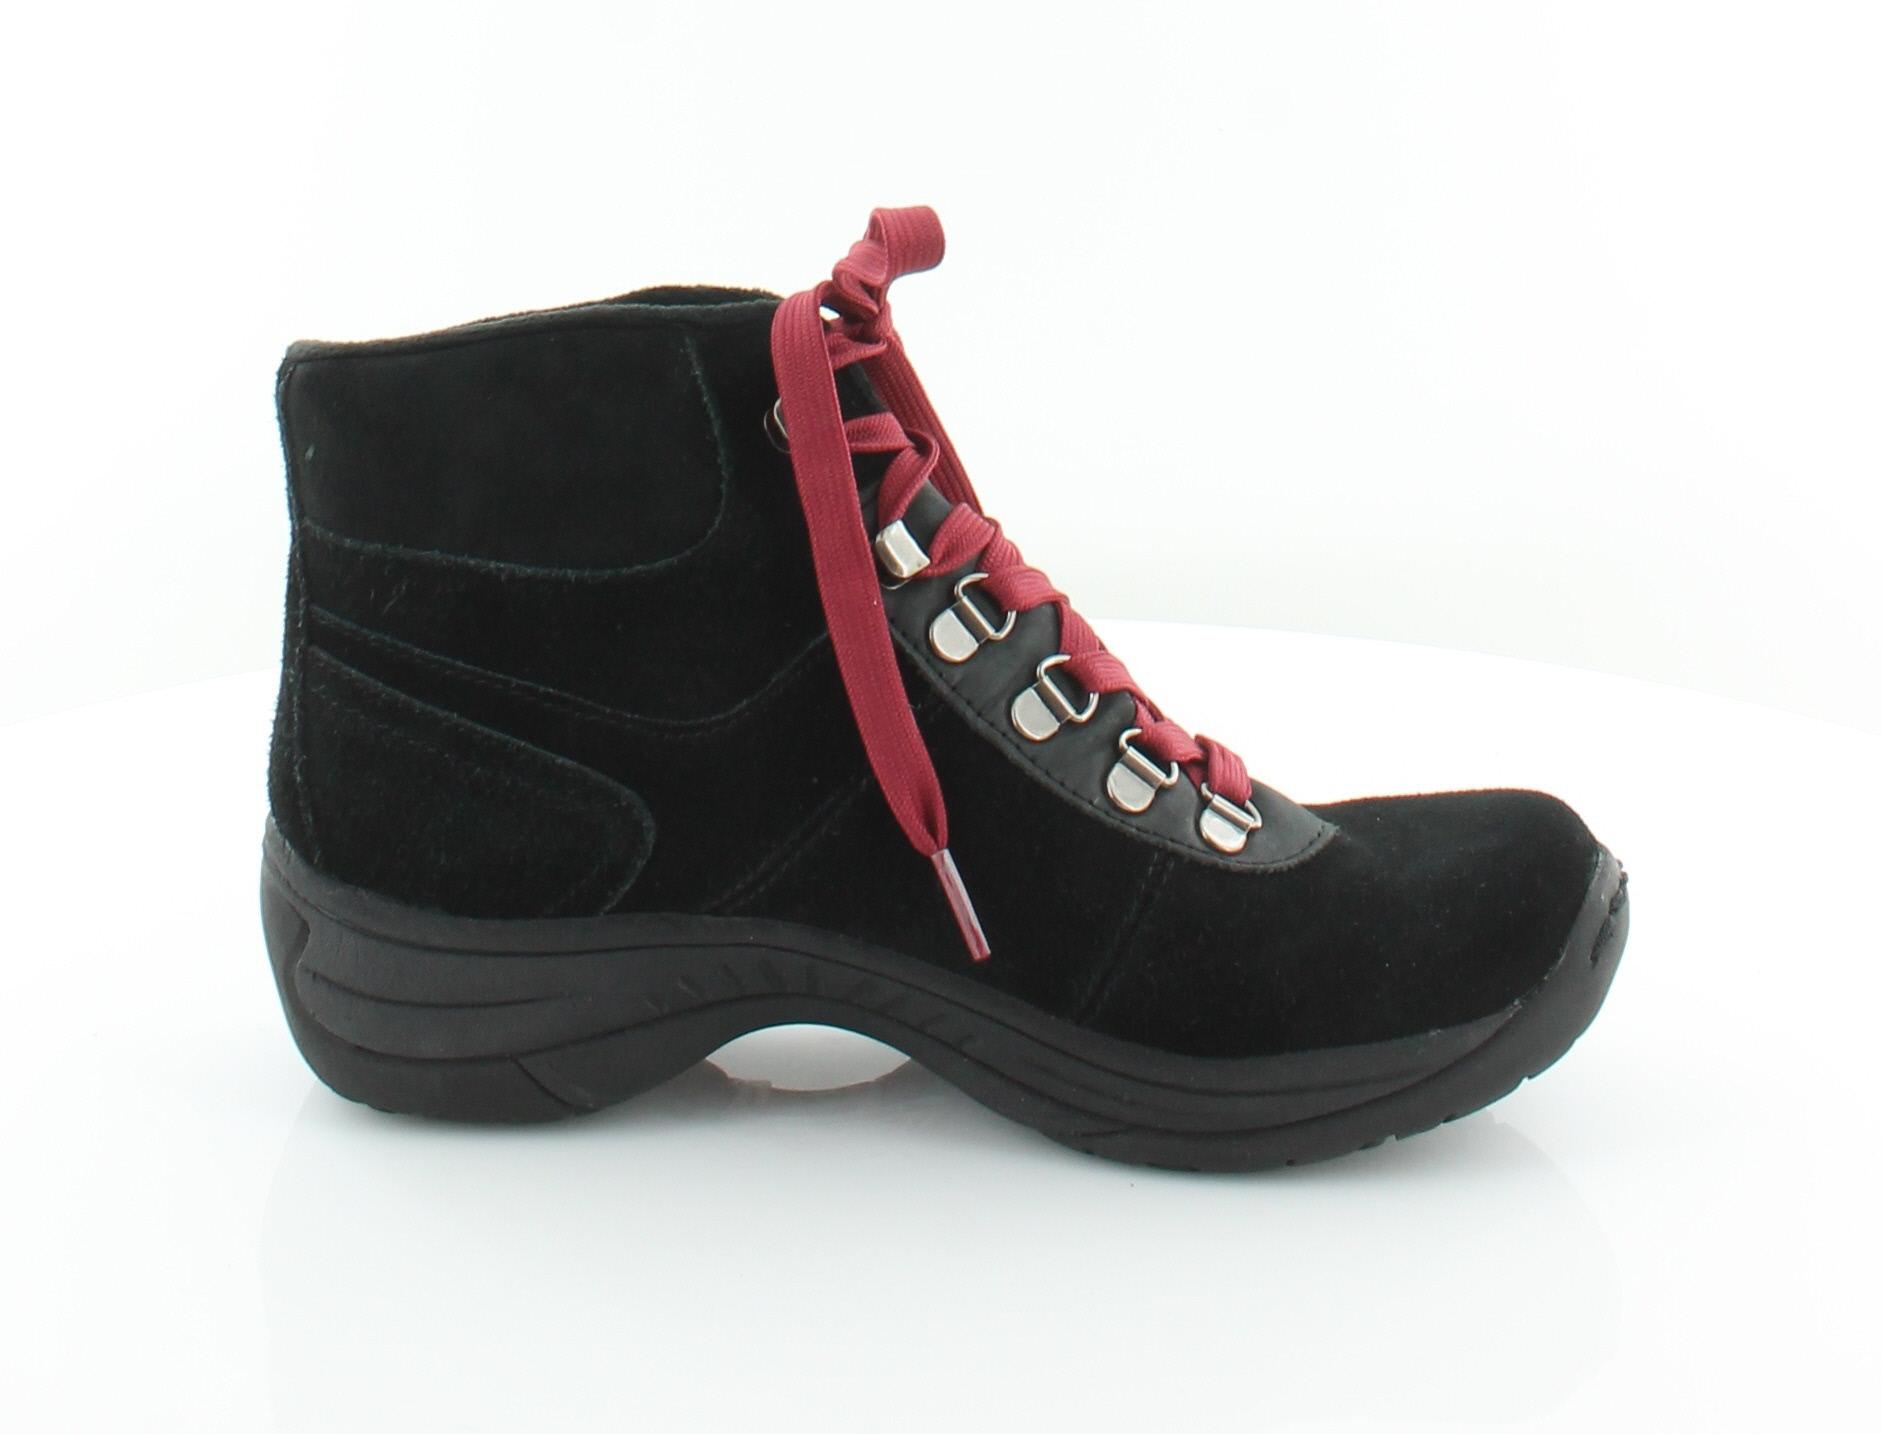 BareTraps Rosie Women's Boots Black Size 7 M